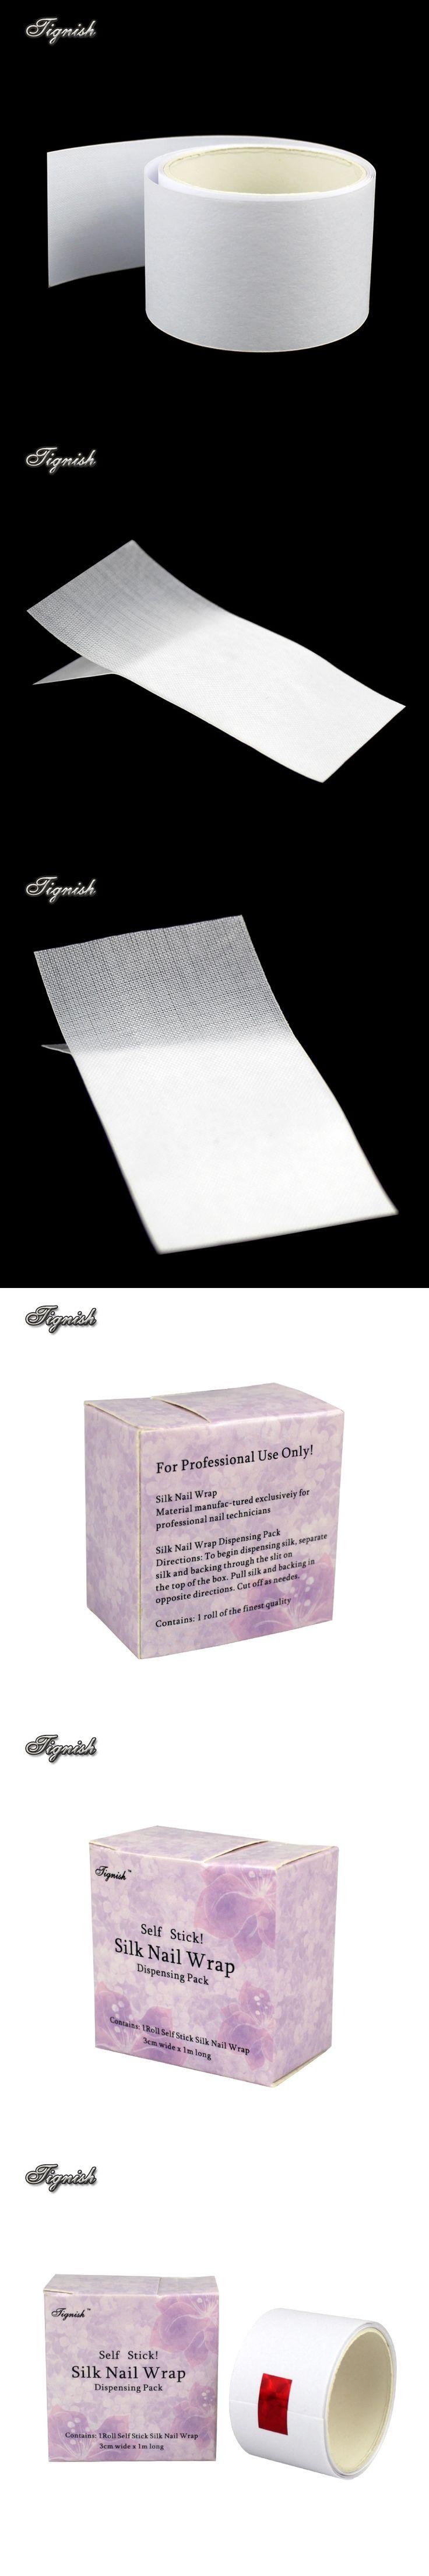 Tignish 1 Roll Silk Fiberglass Nail Wrap Sticker Self Stick 3CM * 1M Reinforces Nail UV Gel Extension Nail Art Tips